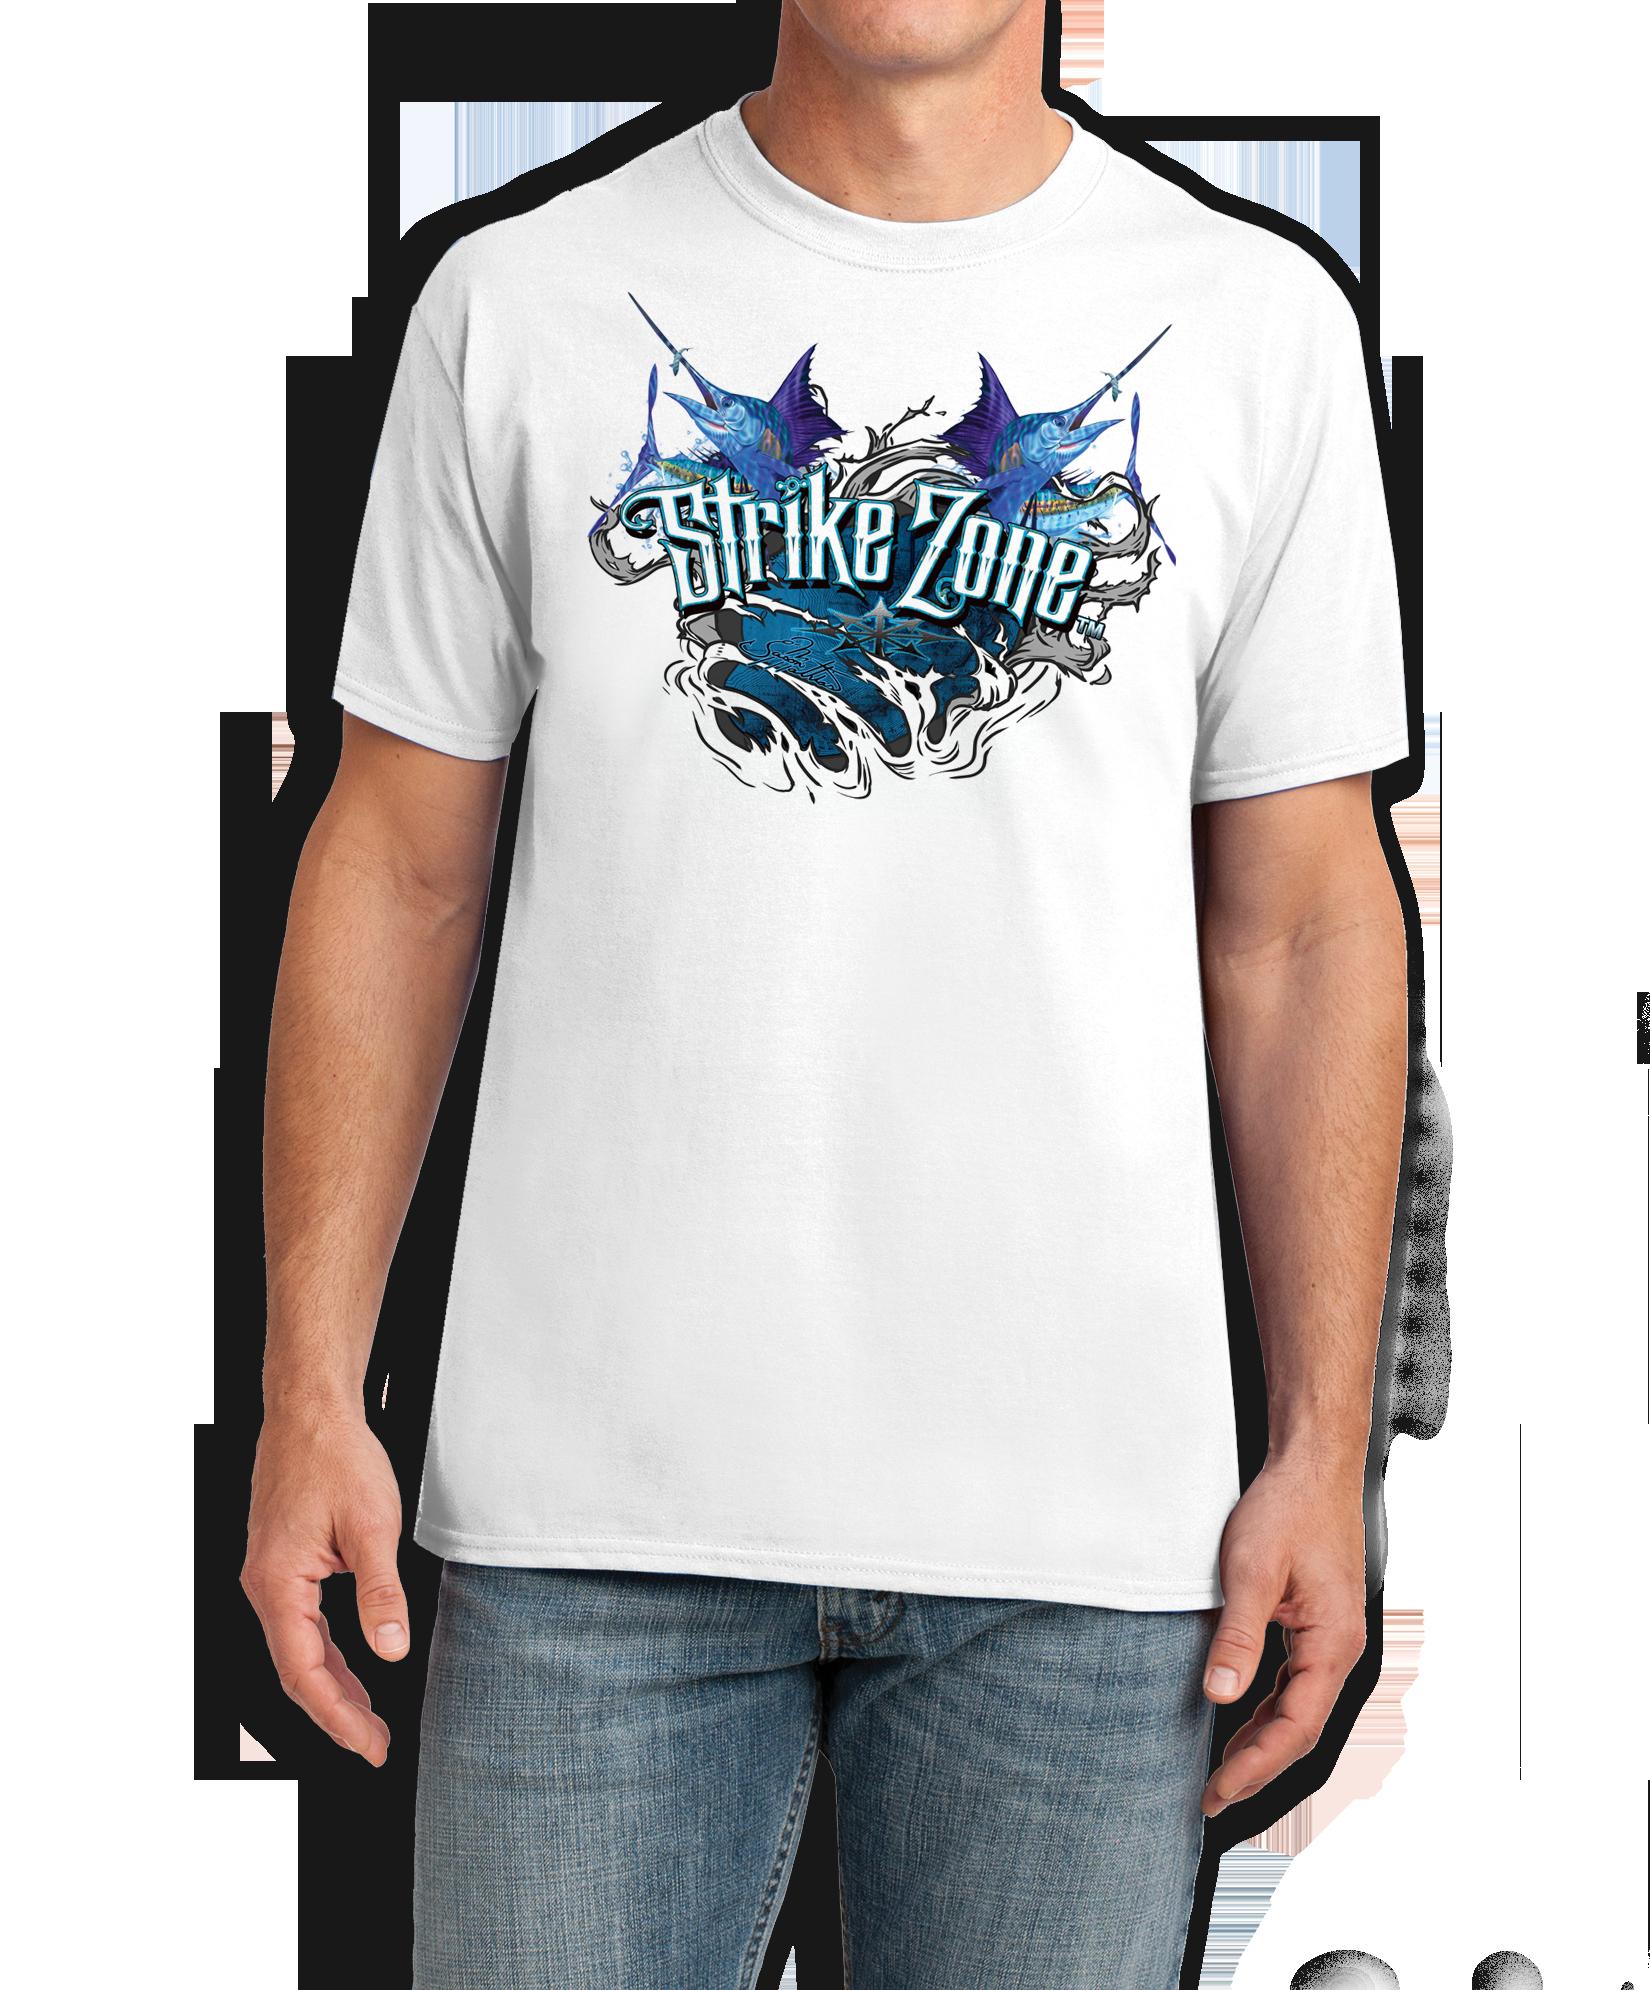 t-shirt-jason-mathias-cotton-white-sailfish-billfish-front-chest.png